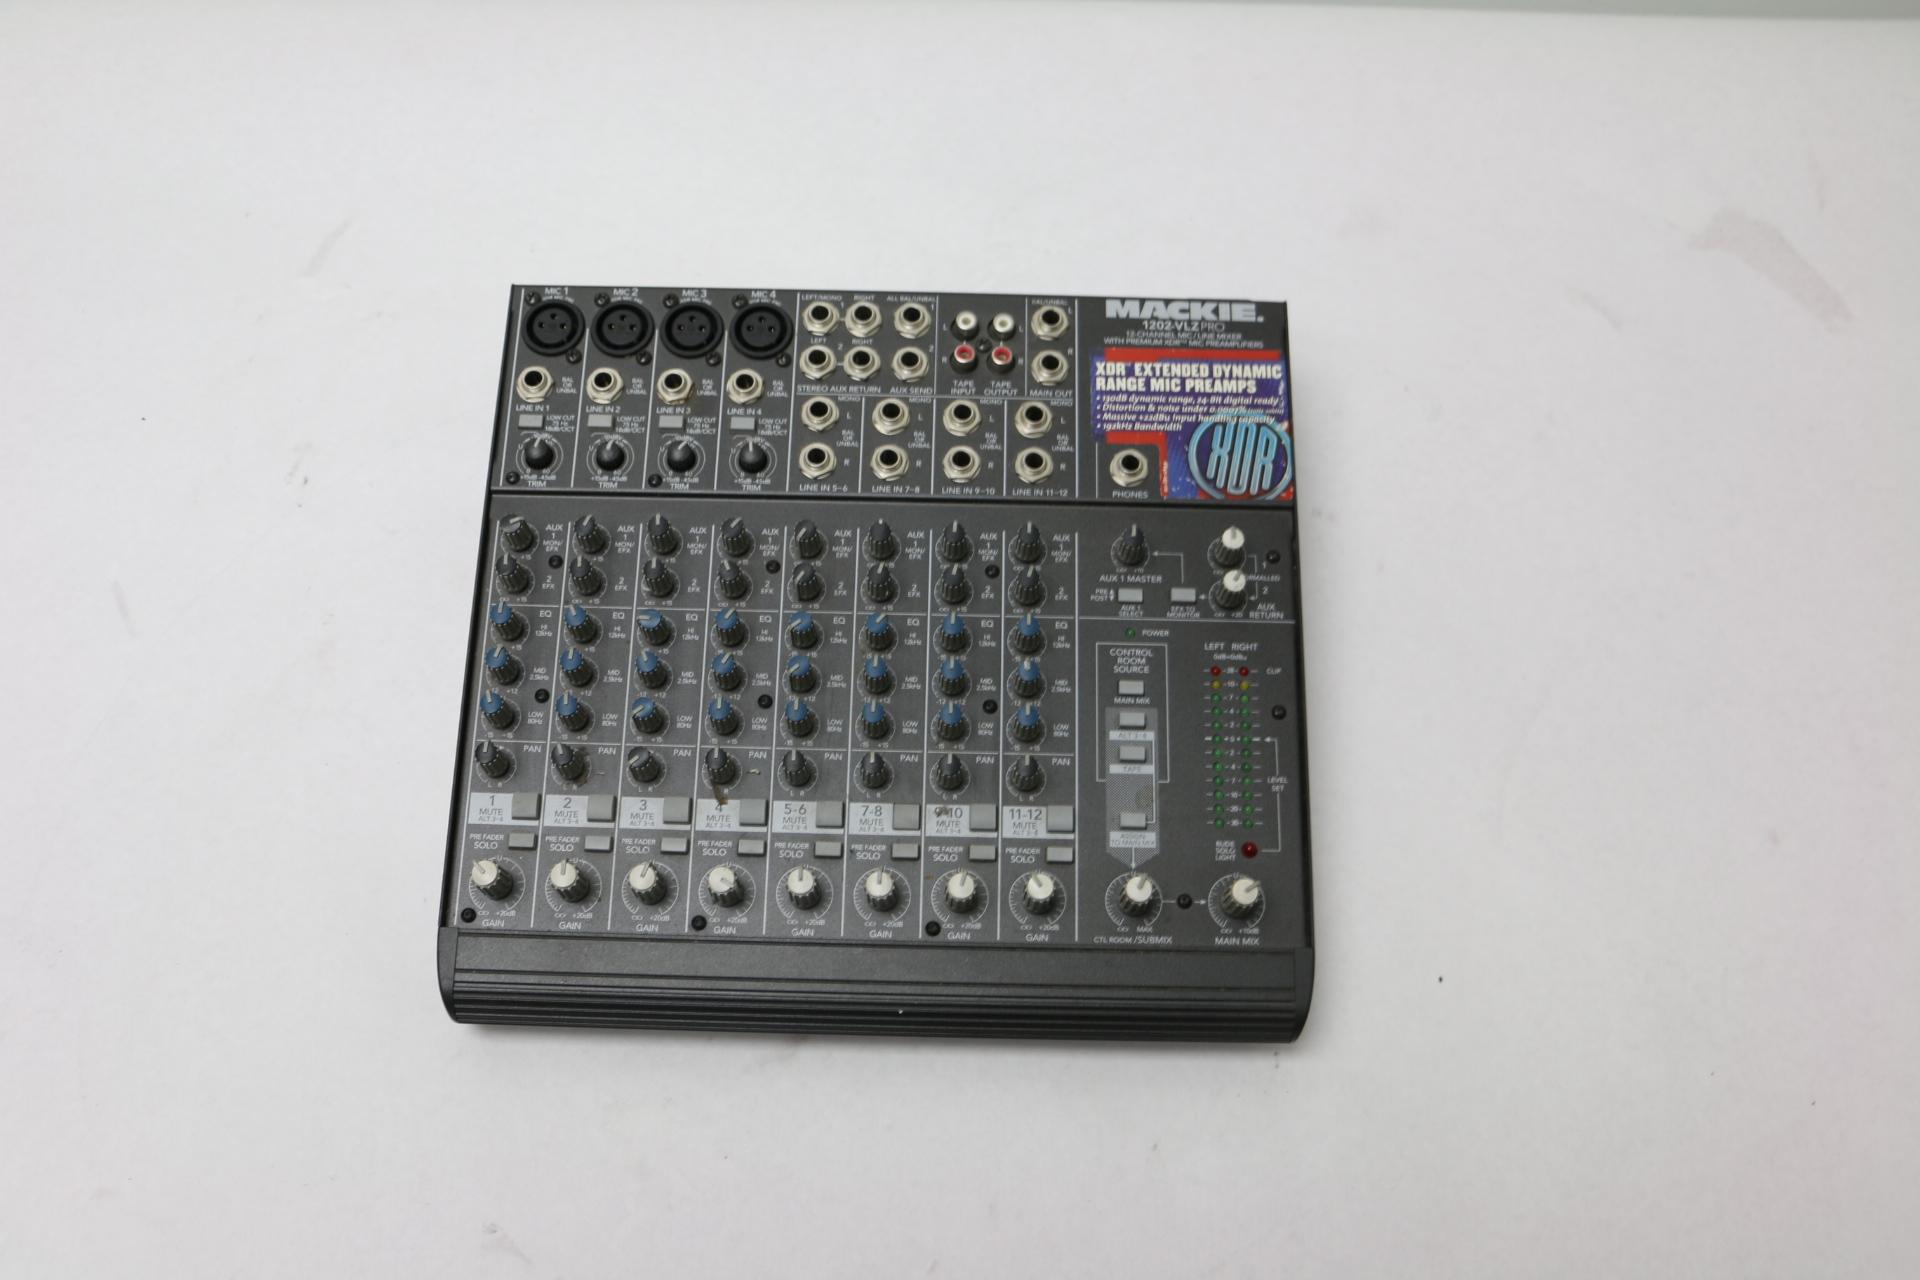 mackie 1202 vlz pro 12 channel mic line mixer w premium xdr mic preamplifiers ebay. Black Bedroom Furniture Sets. Home Design Ideas